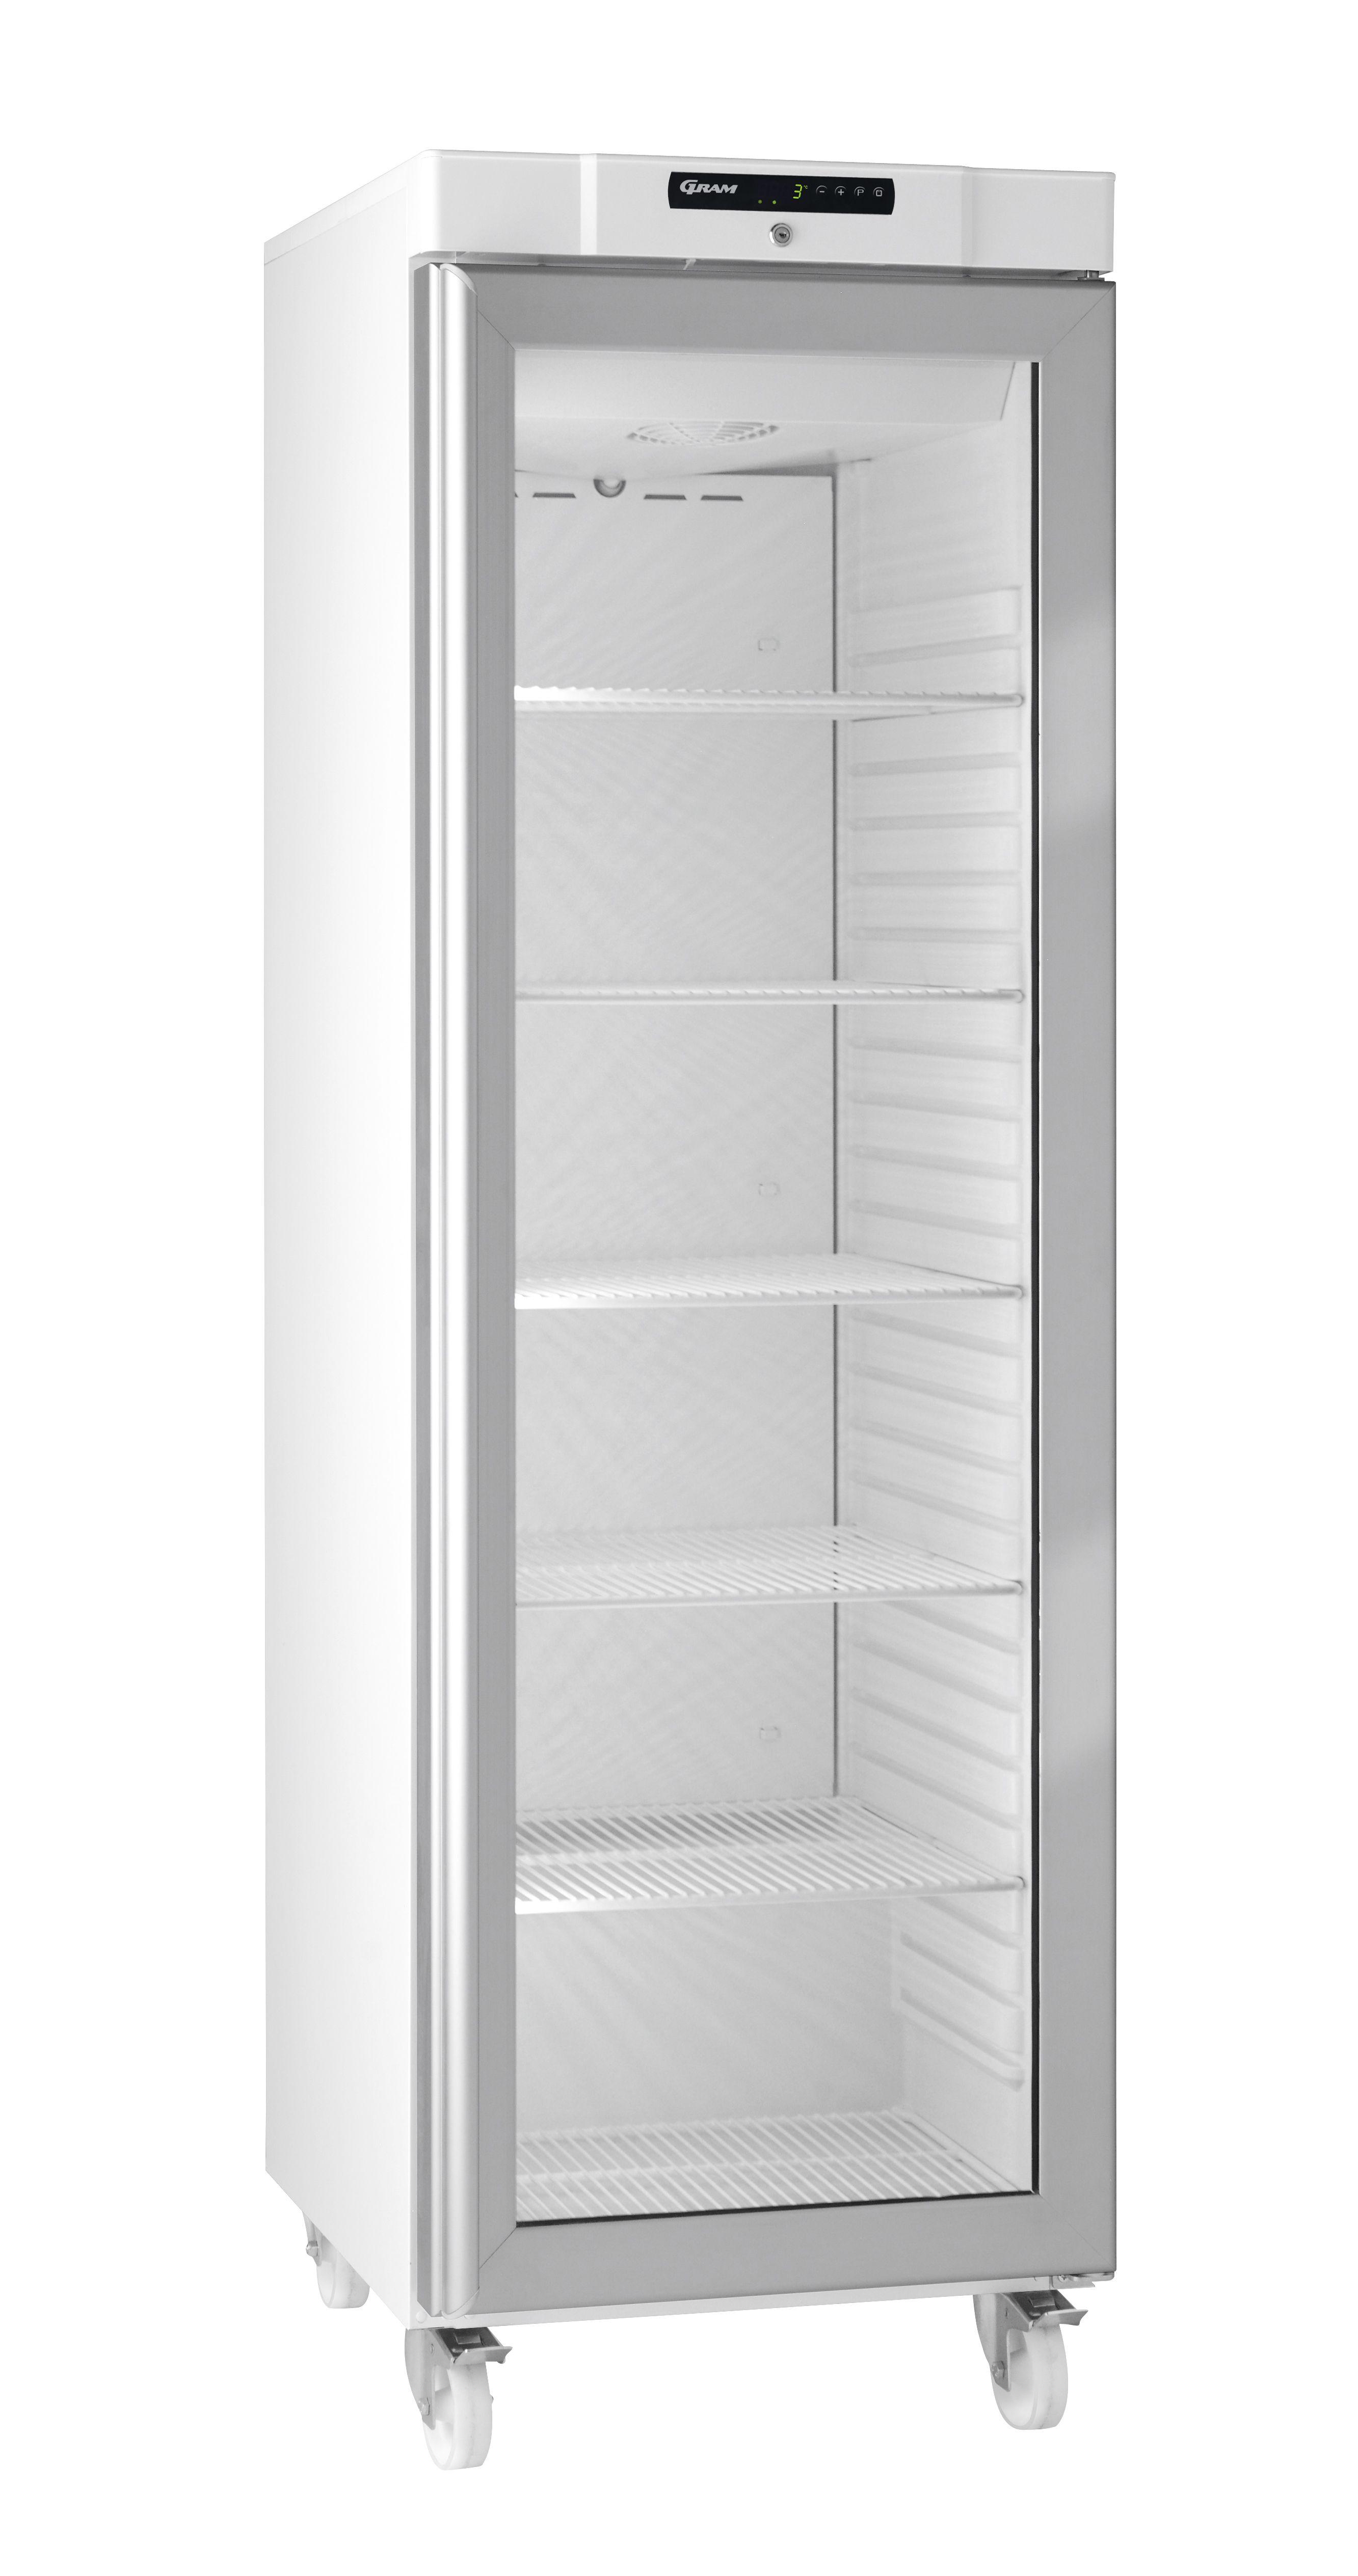 Gram Compact Kg 410 Lg C 6w Glass Door Fridge 346 Ltr F366